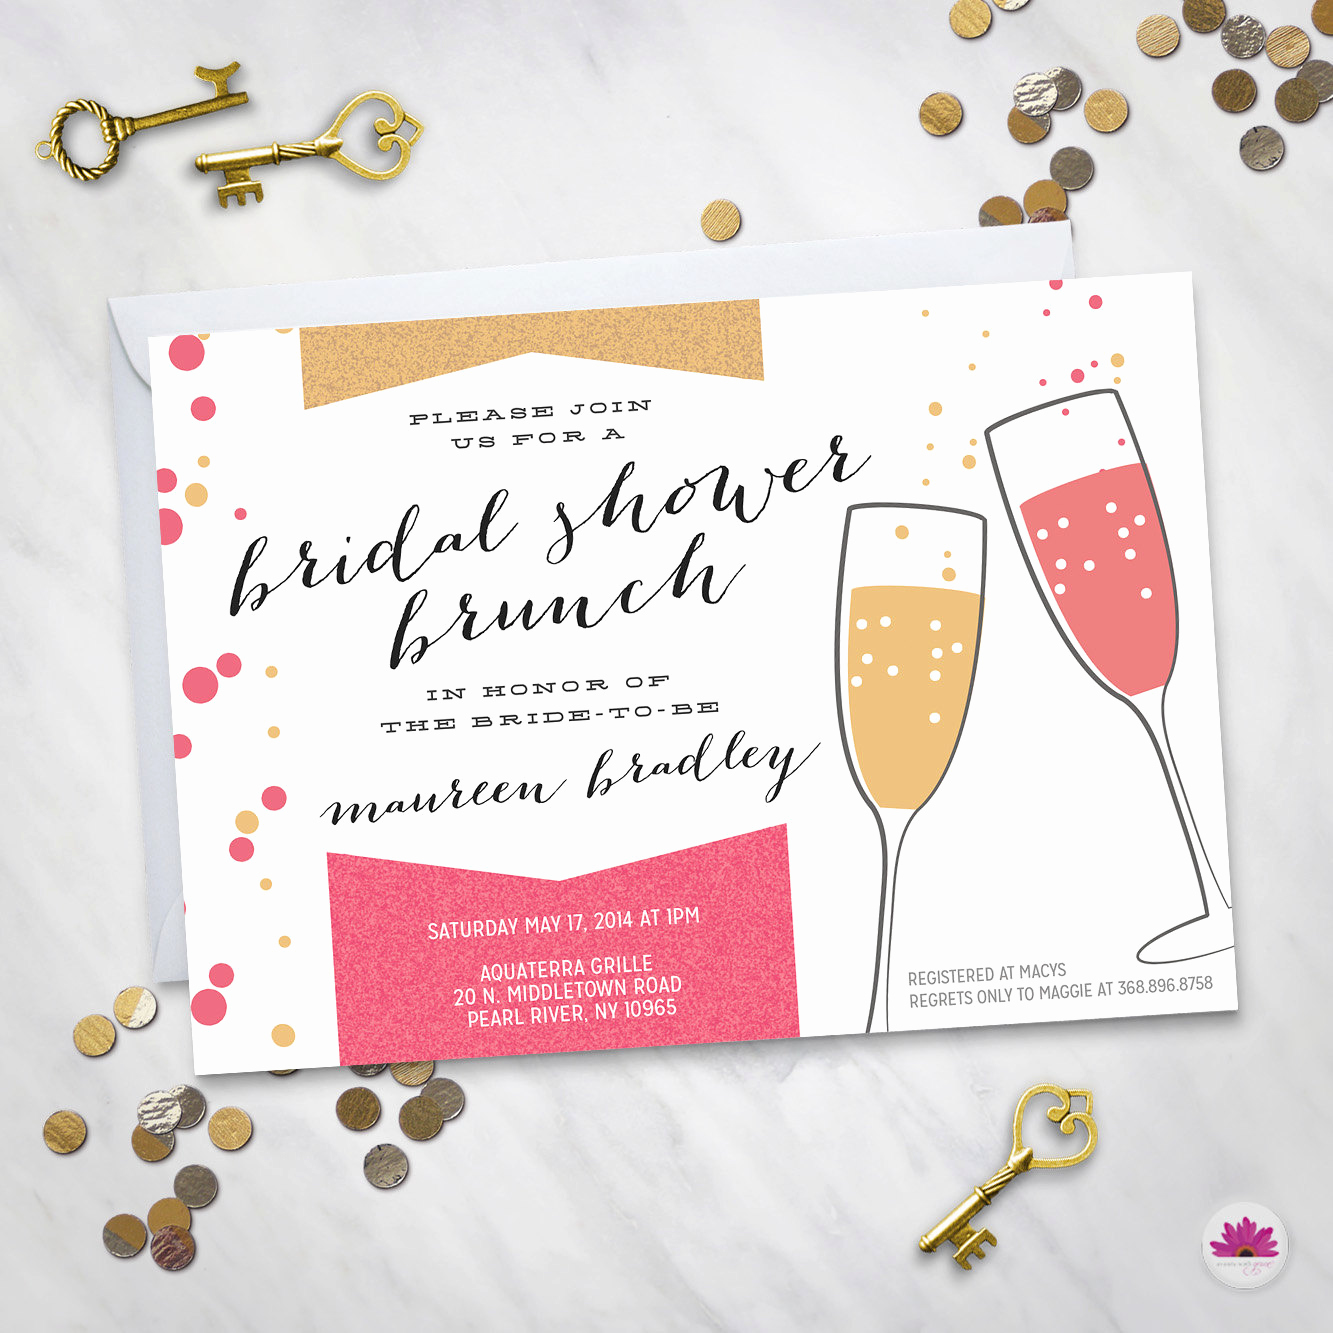 Bridal Shower Brunch Invitation Unique Bridal Shower Brunch Invitation Digital File